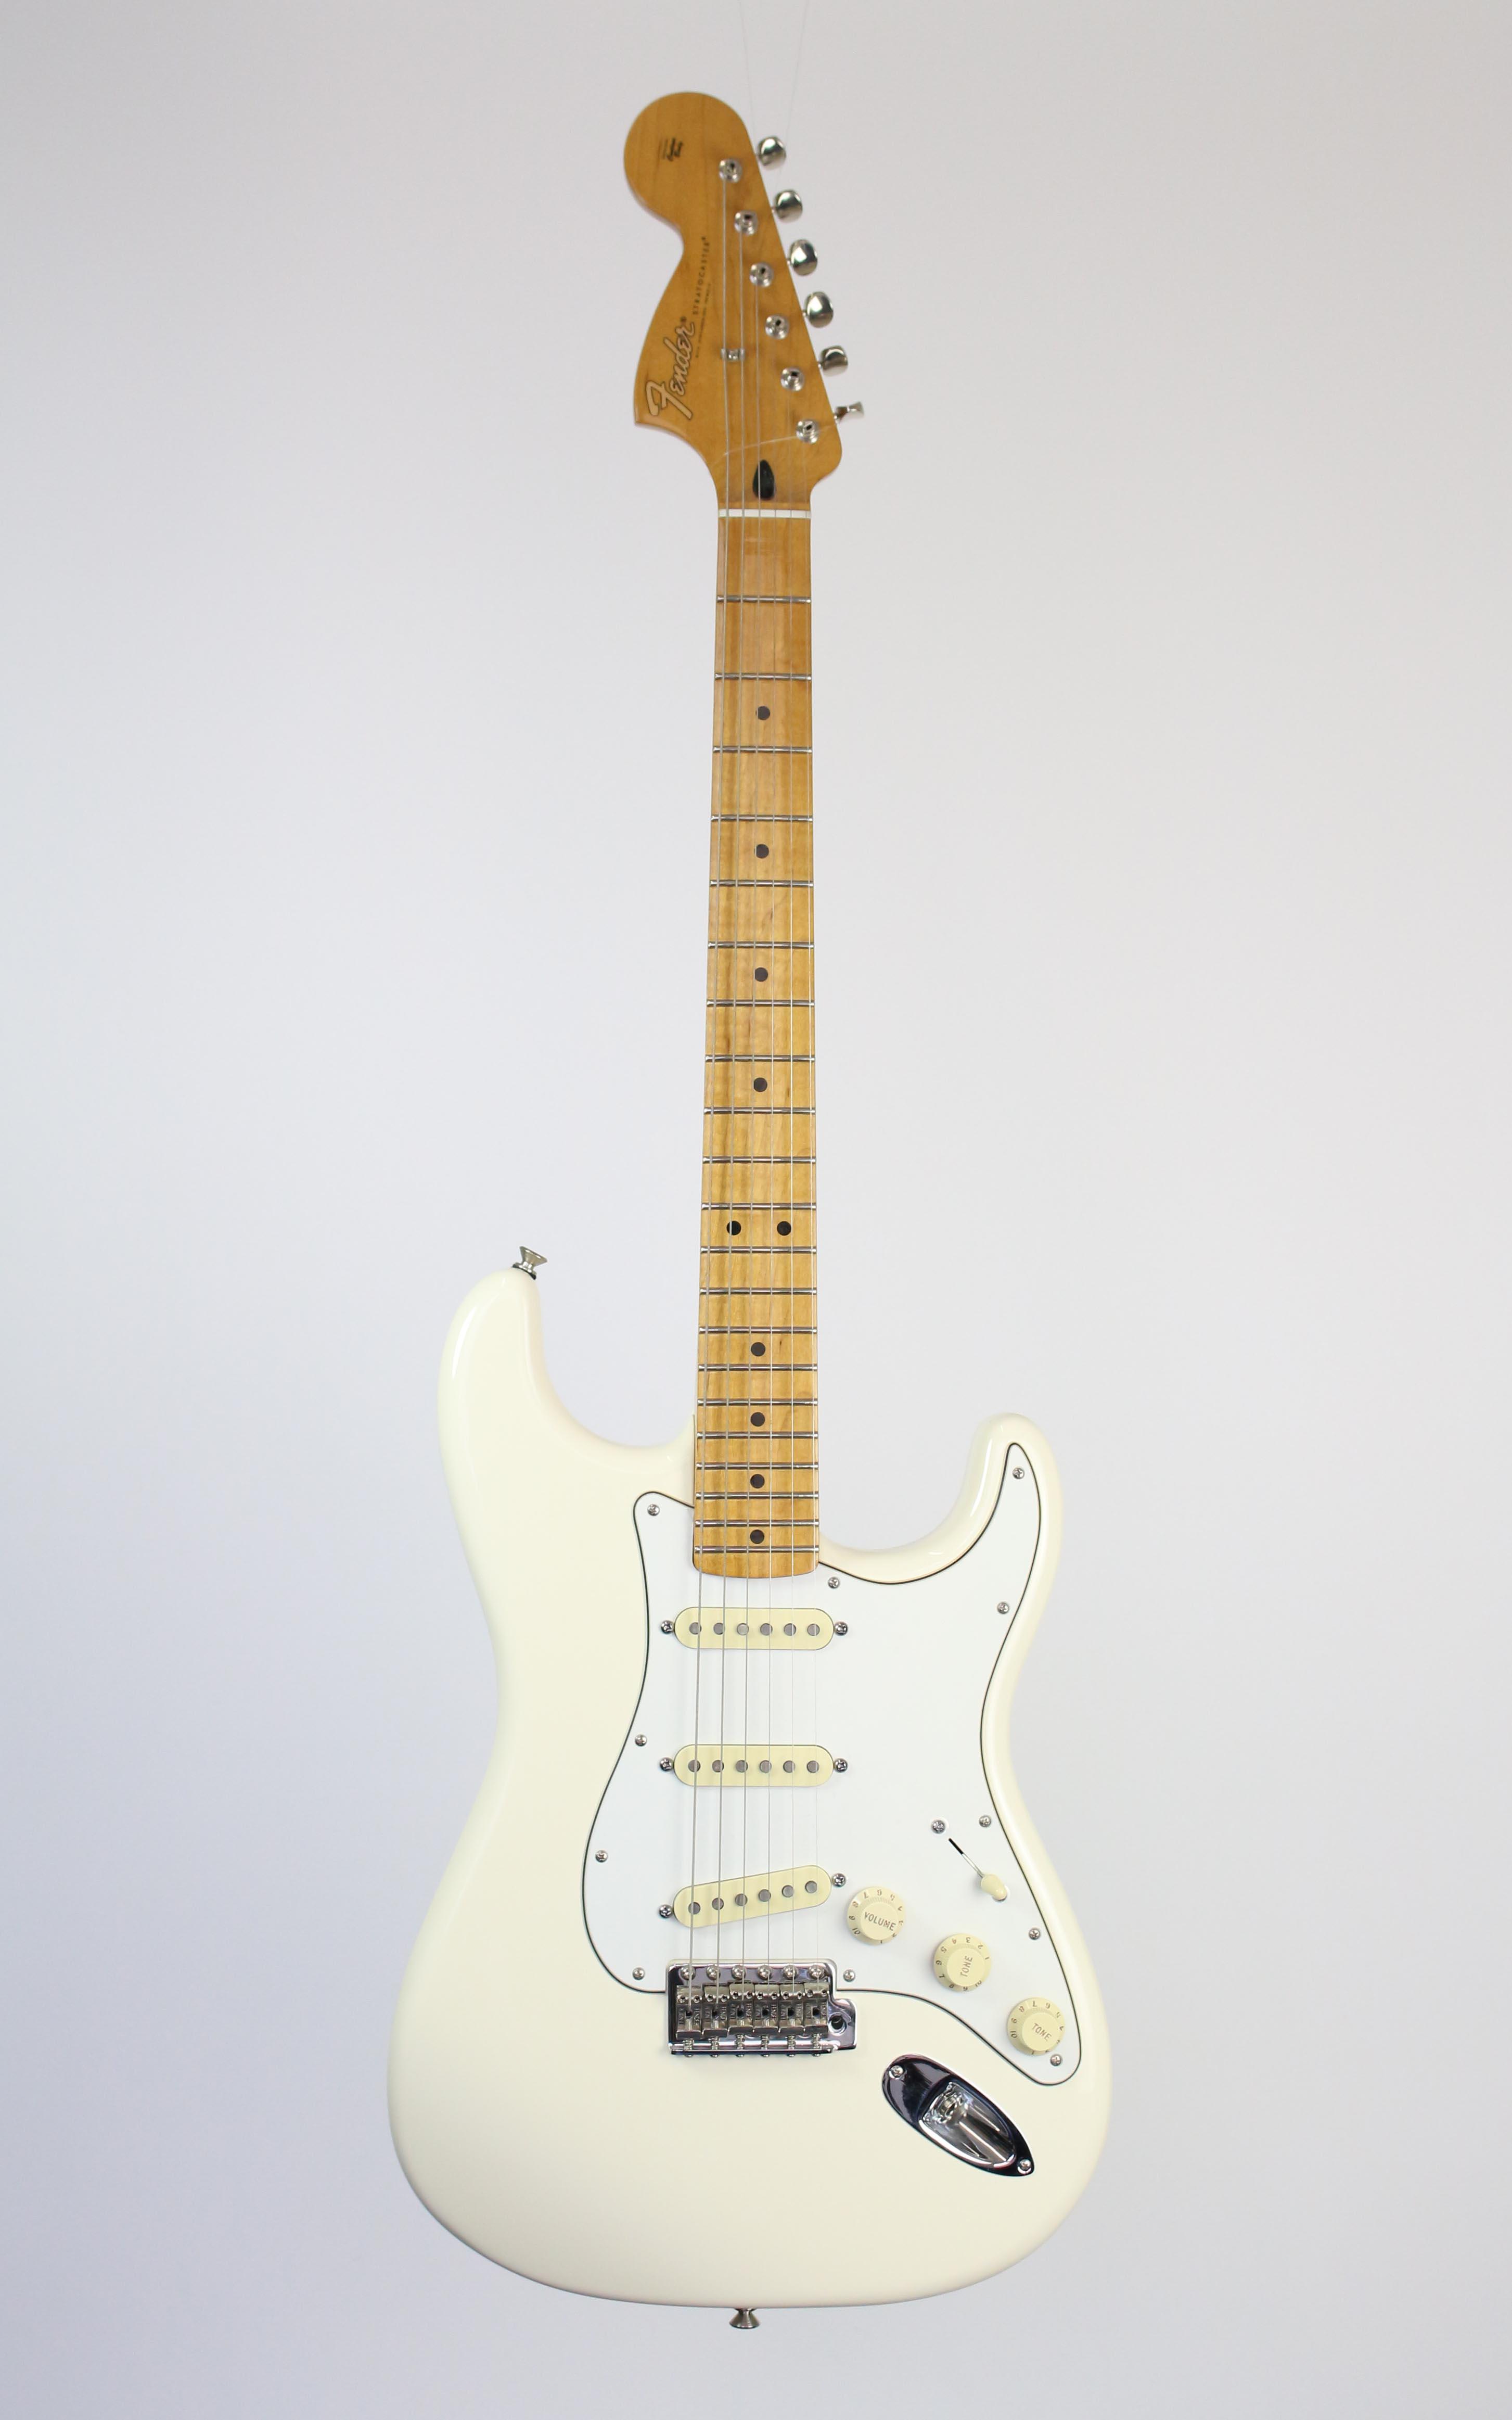 Fender - Jimi Hendrix Strat MN Olympic White - Gitarren - E-Gitarren | MUSIK BERTRAM Deutschland Freiburg